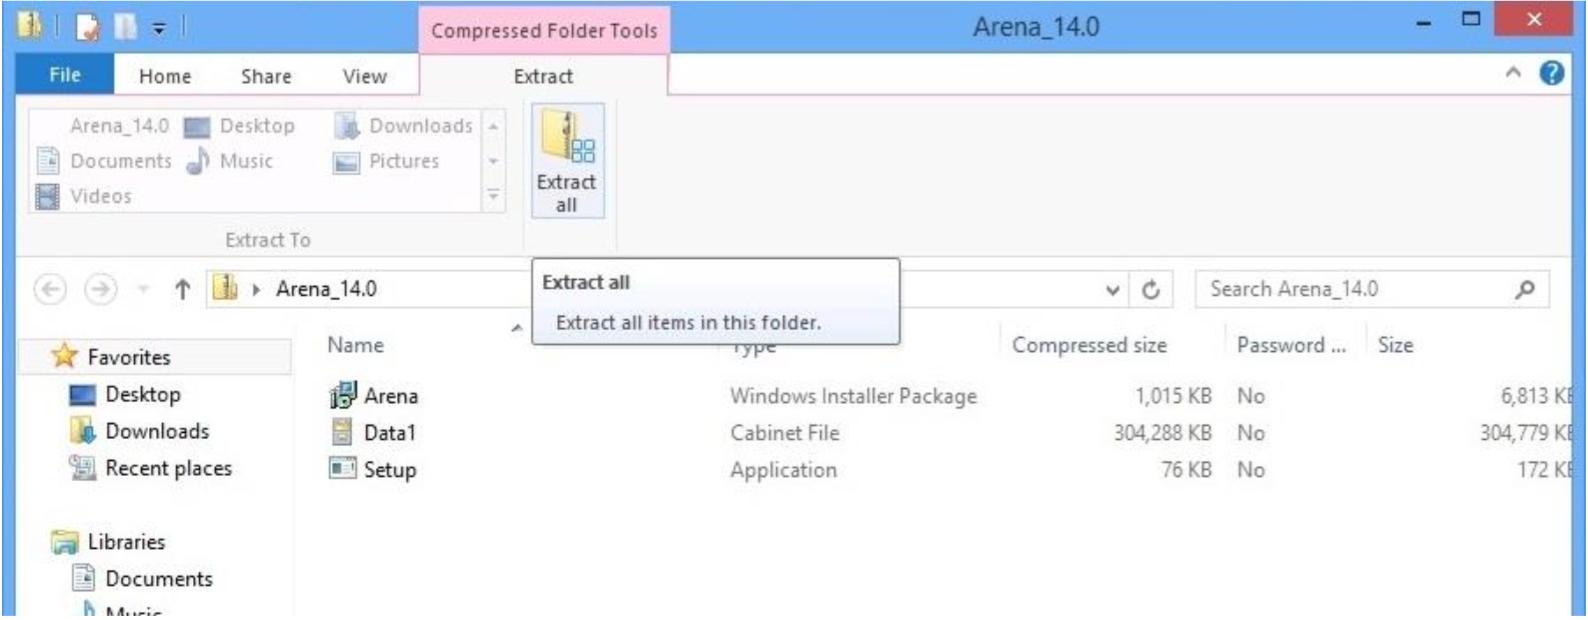 Arena 14 0 Installation Instructions (Windows 8/8 1)